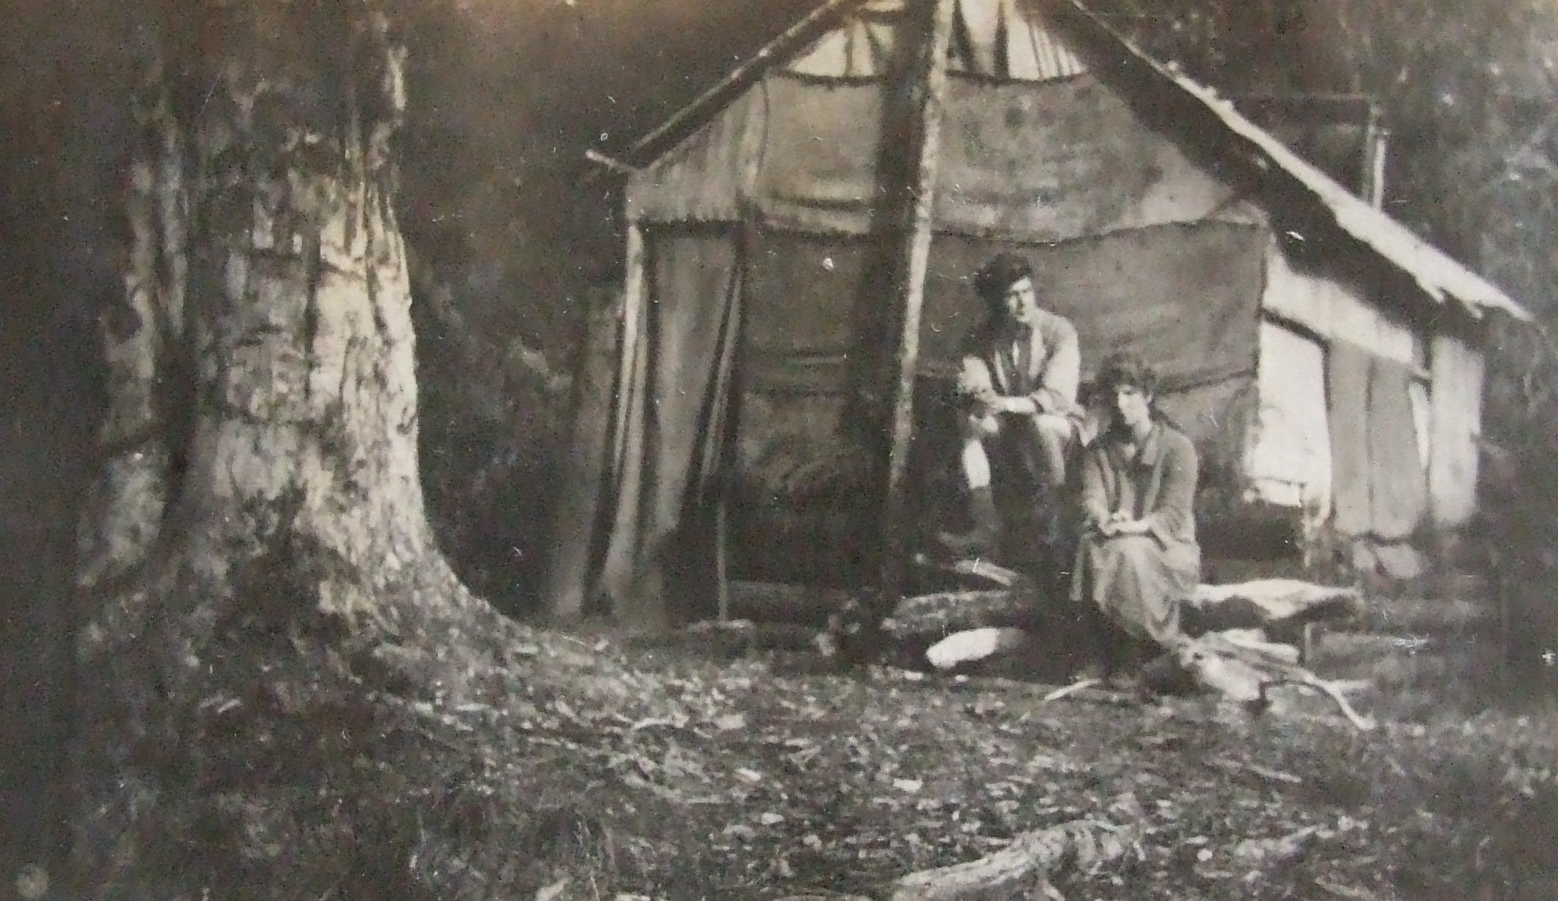 Baines Camp 1920